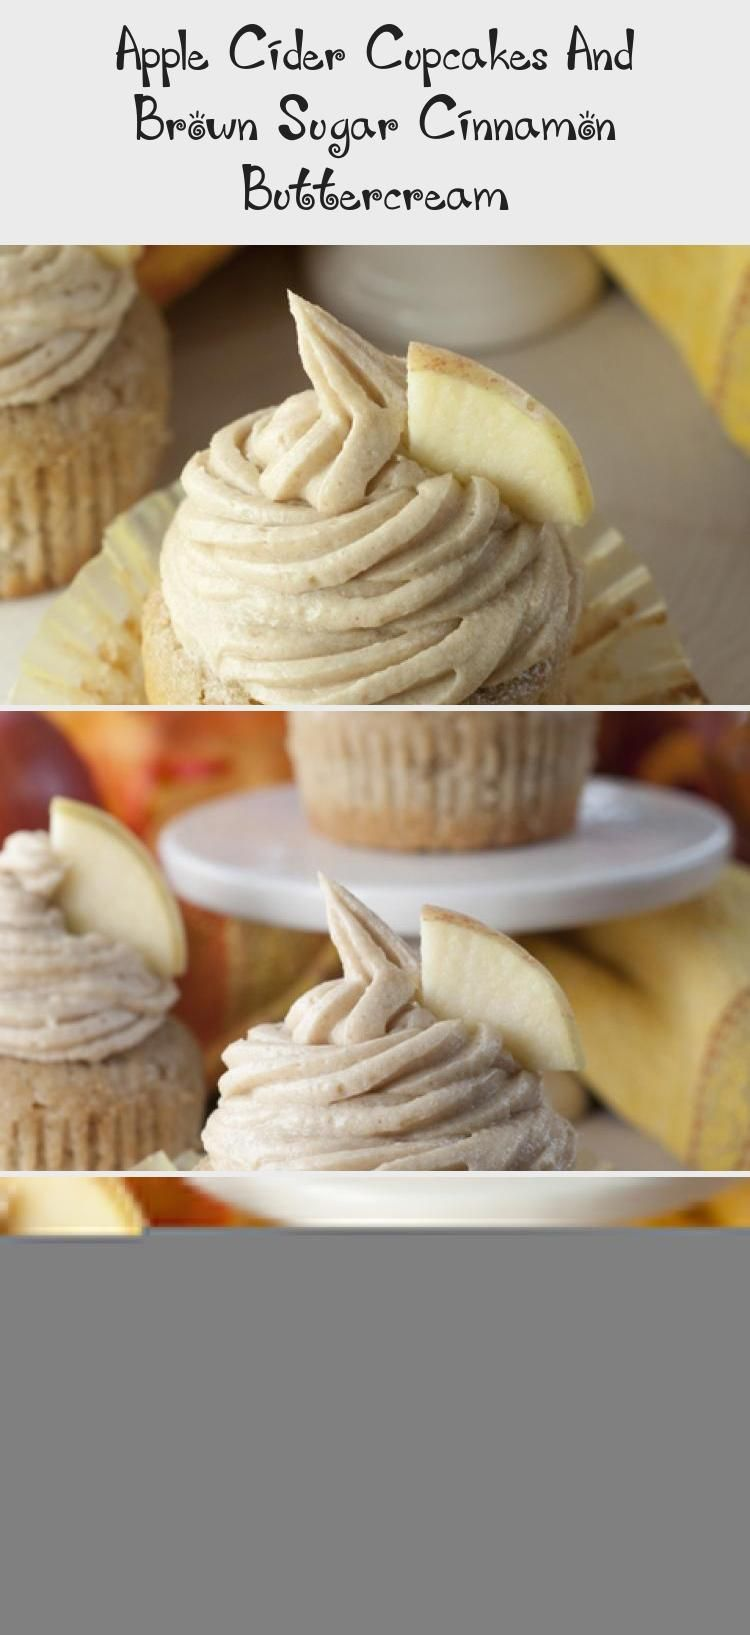 Apple Cider Cupcakes And Brown Sugar Cinnamon Buttercream - Dessert Recipes #applecidercupcakeswithbrownsugar Apple Cider Cupcakes & Brown Sugar Cinnamon Buttercream | Wishes and Dishes #InstantPotDessertRecipes #BerryDessertRecipes #AmazingDessertRecipes #DessertRecipesChocolate #DessertRecipesPie #applecidercupcakeswithbrownsugar Apple Cider Cupcakes And Brown Sugar Cinnamon Buttercream - Dessert Recipes #applecidercupcakeswithbrownsugar Apple Cider Cupcakes & Brown Sugar Cinnamon Buttercream